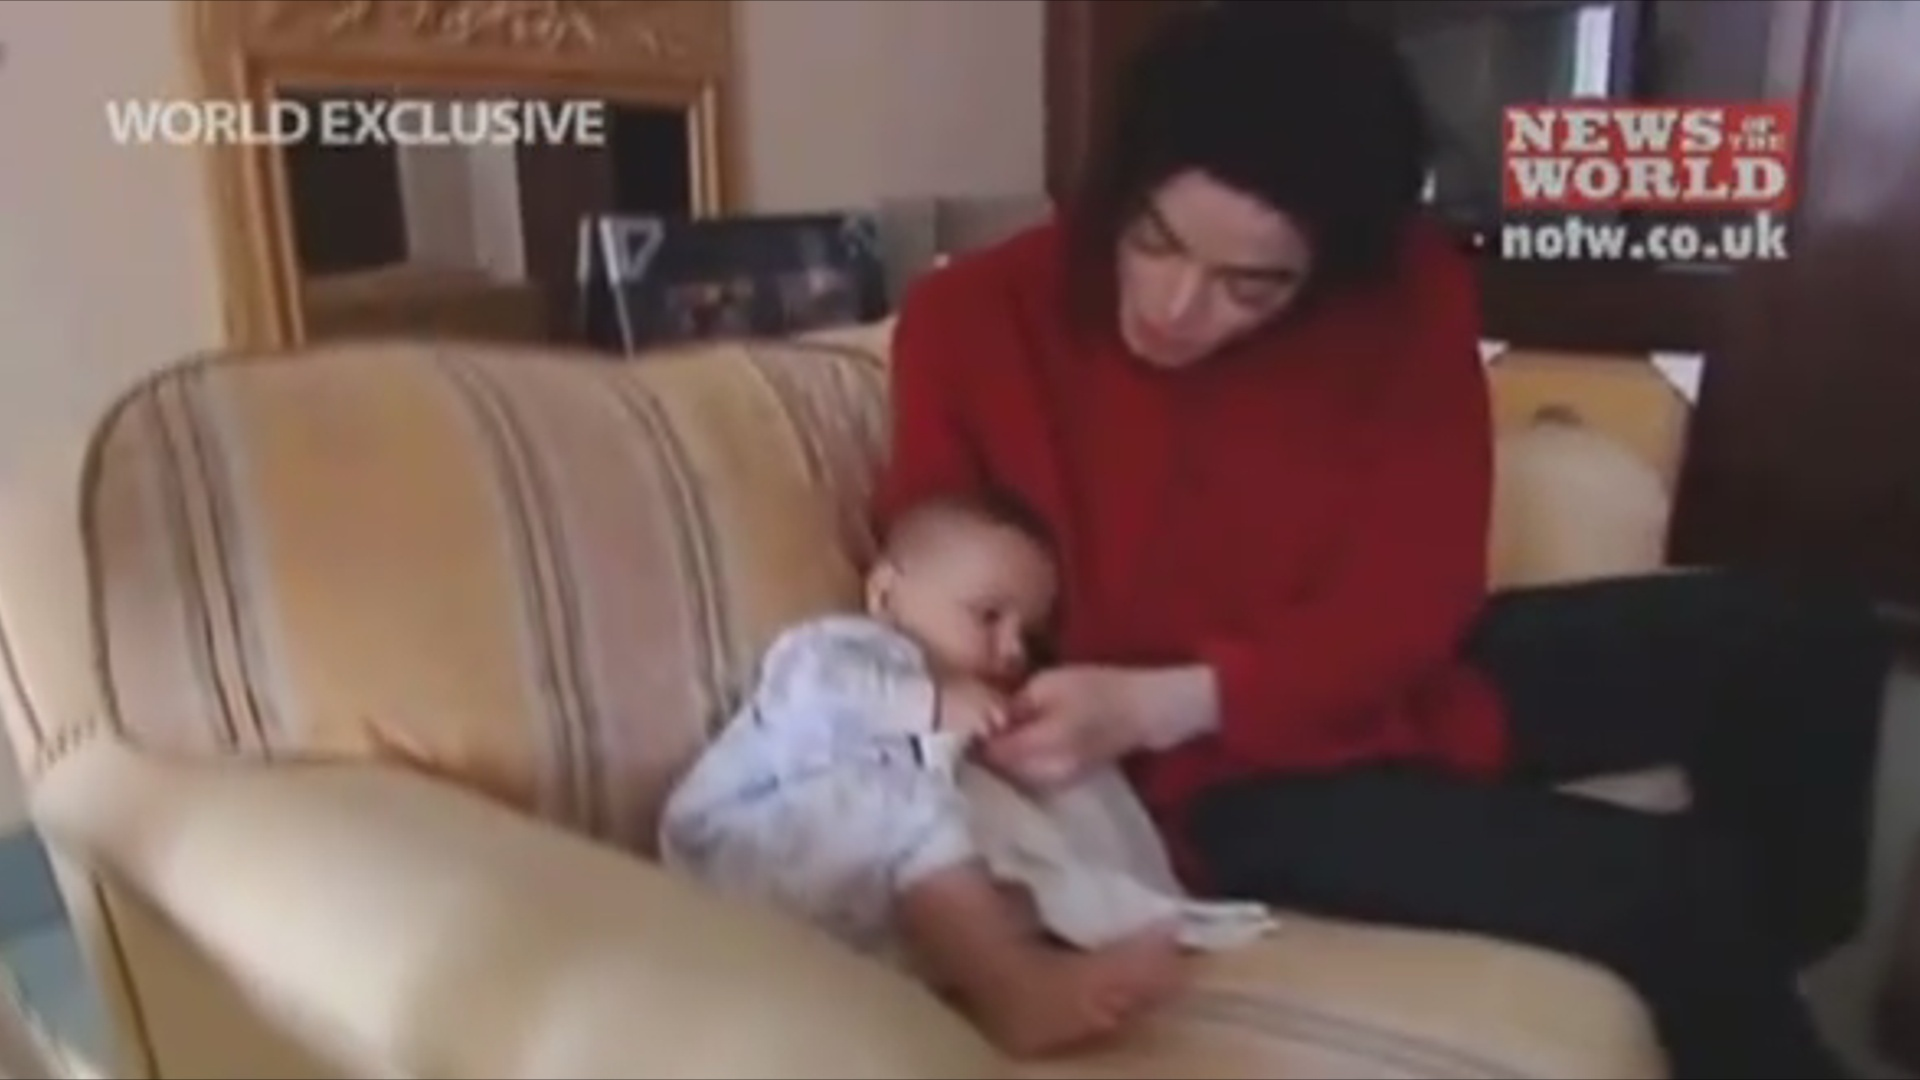 Prince puking as a baby - prince-michael-jackson